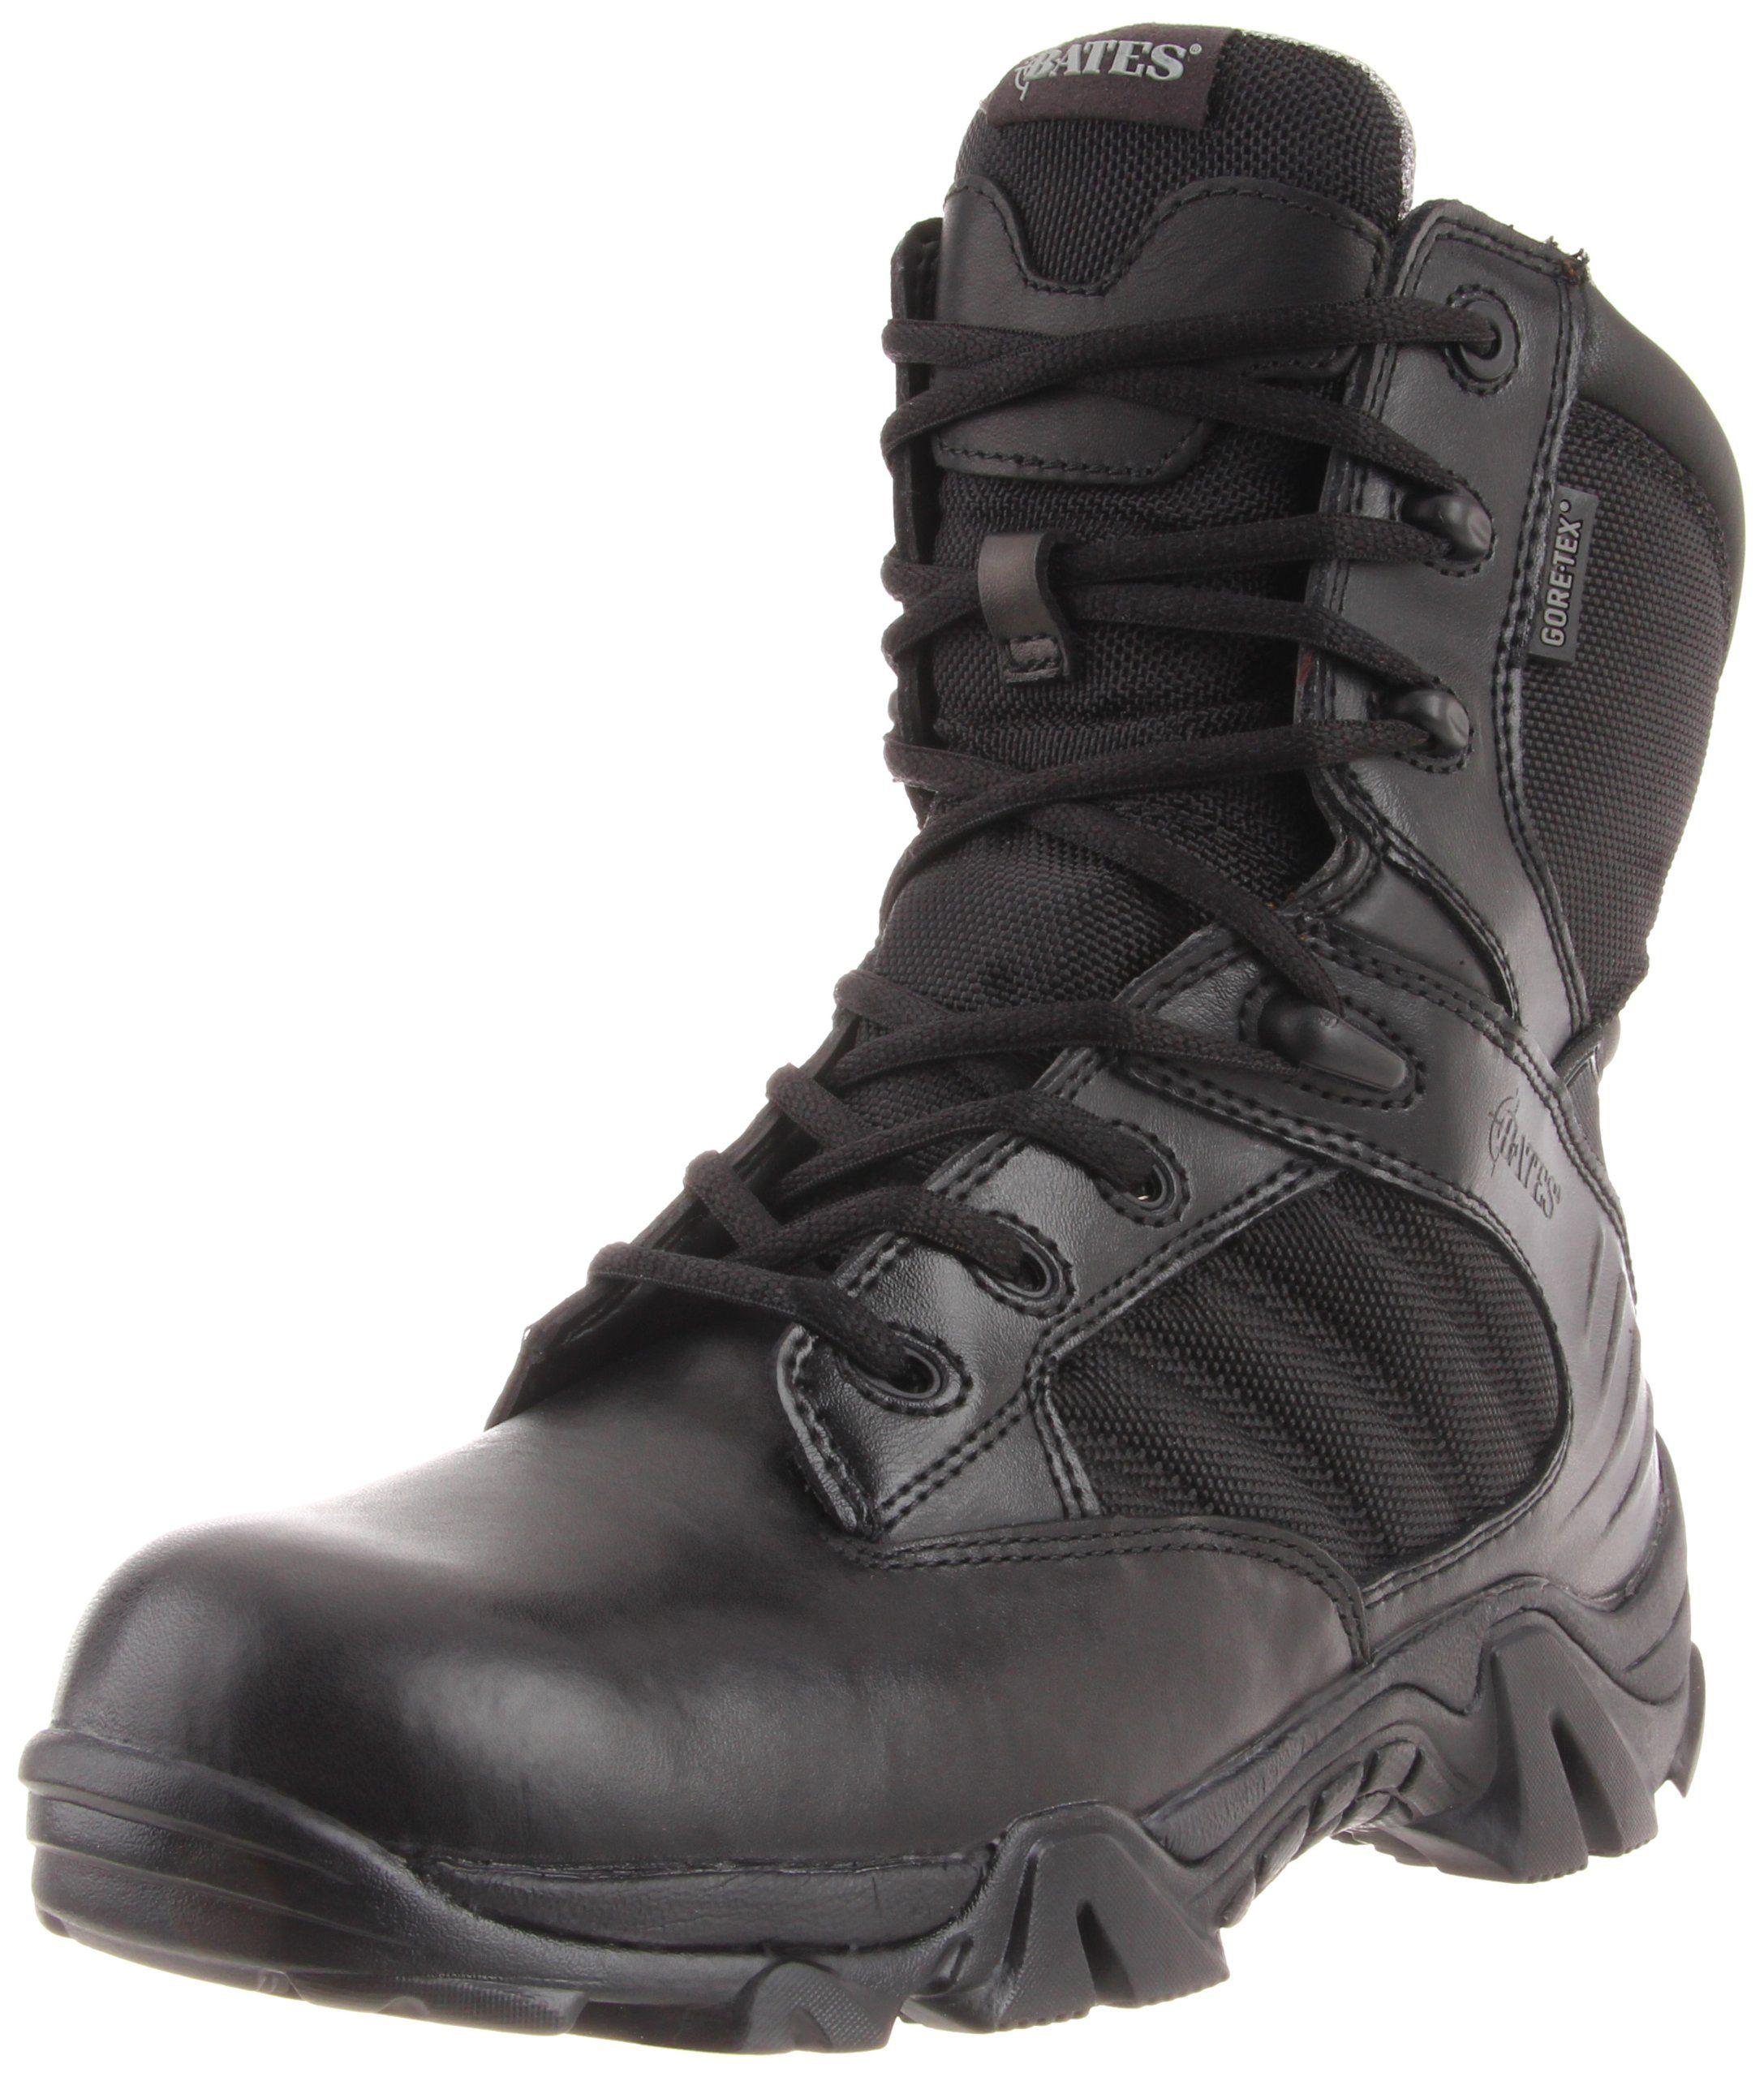 b865e19b1ae Bates Men's GX-8 8 Inch Ultra-Lites GTX Waterproof Boot, Black, 12 ...